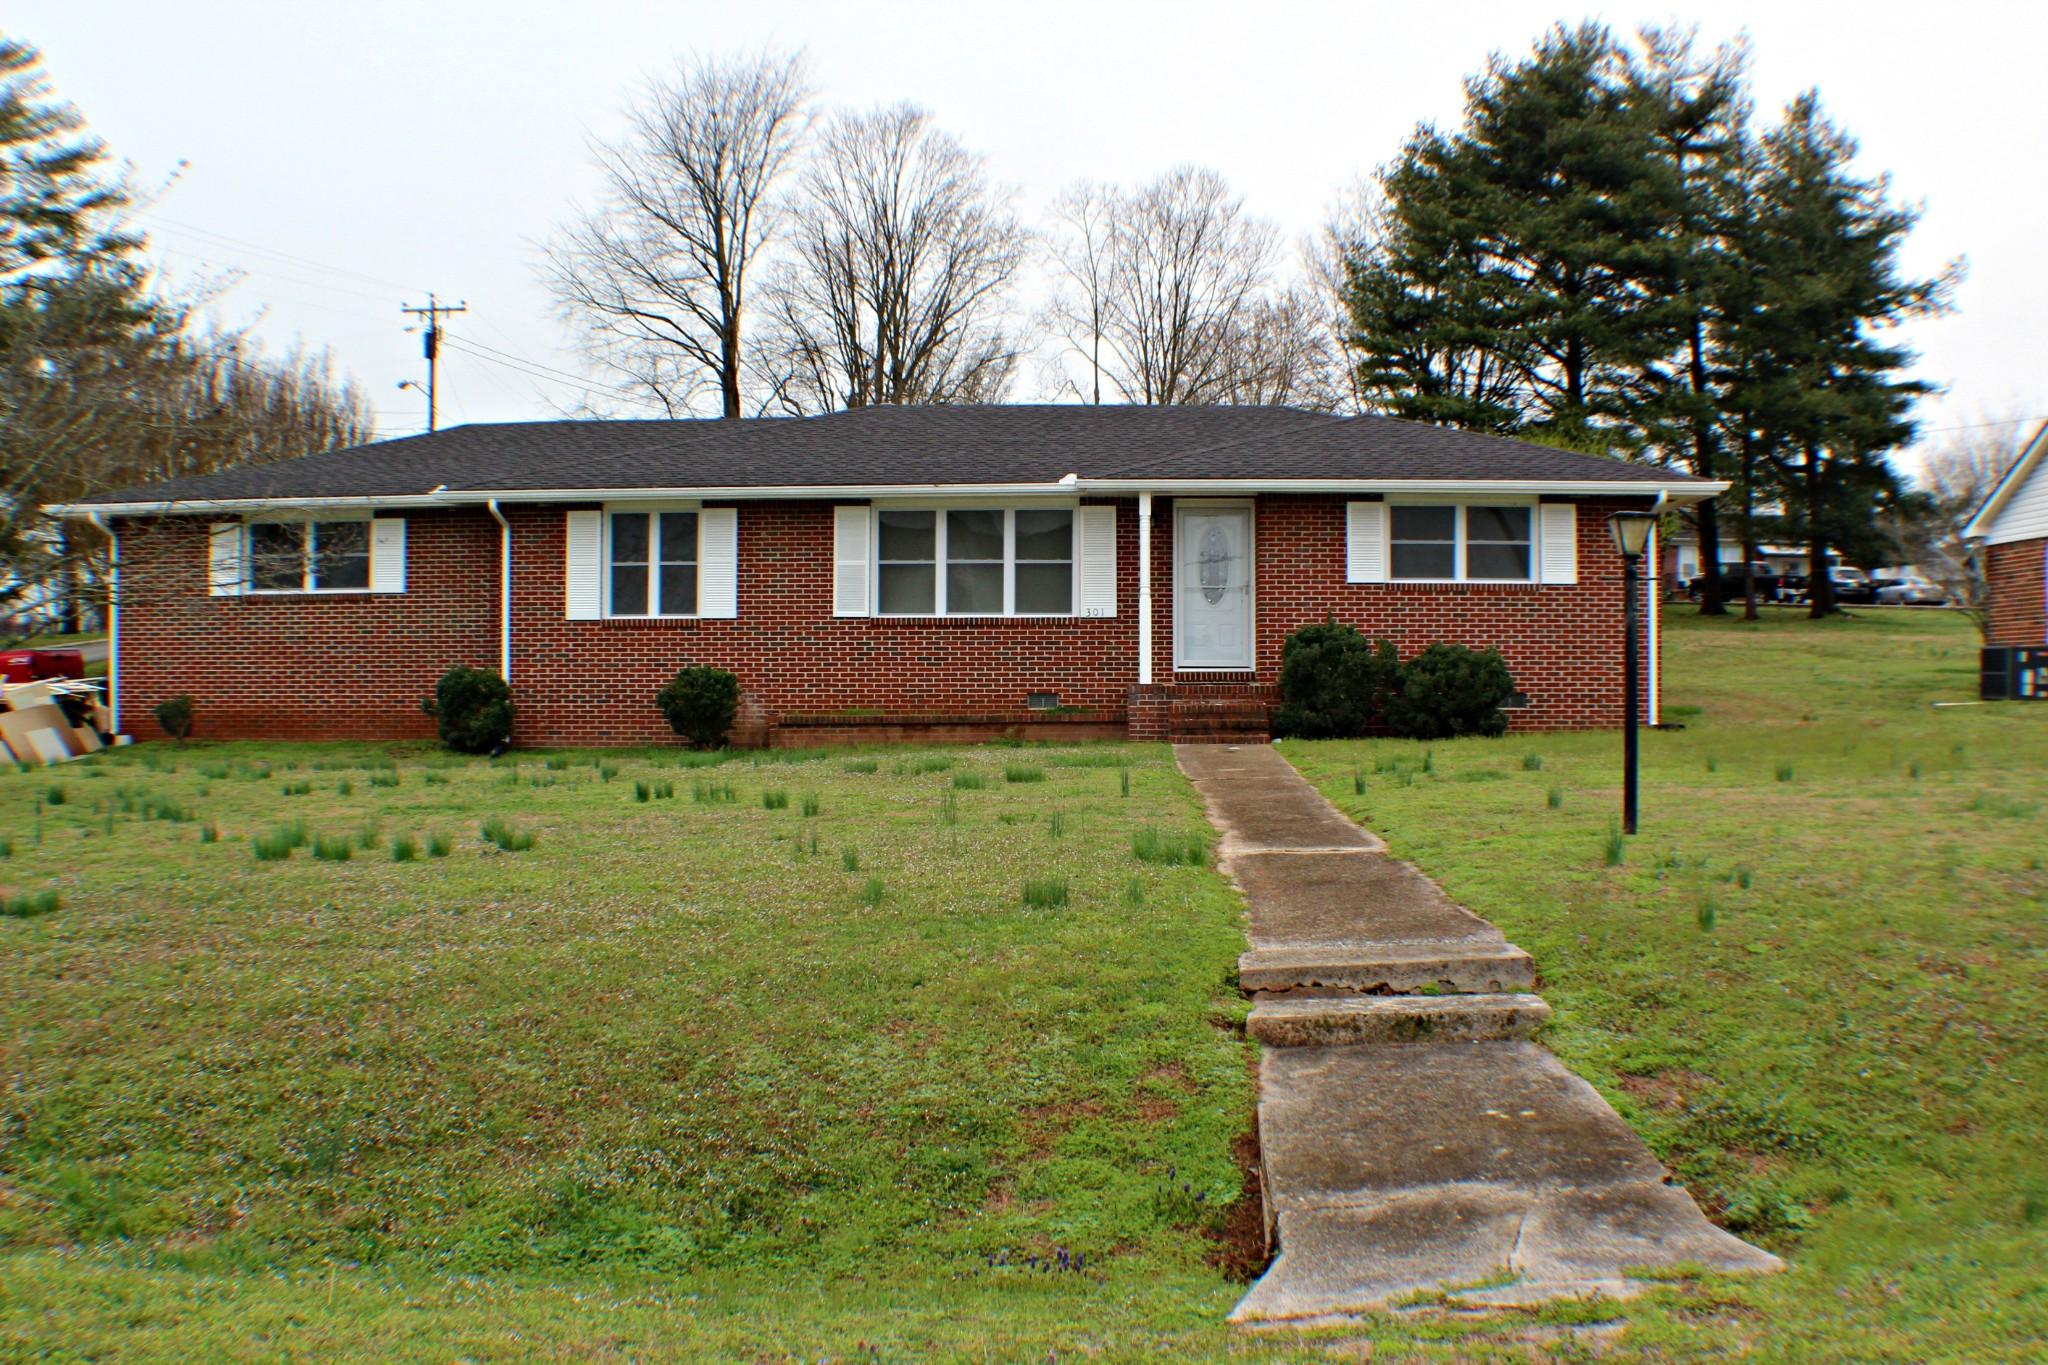 301N 2nd Ave, N, Decherd, TN 37324 - Decherd, TN real estate listing